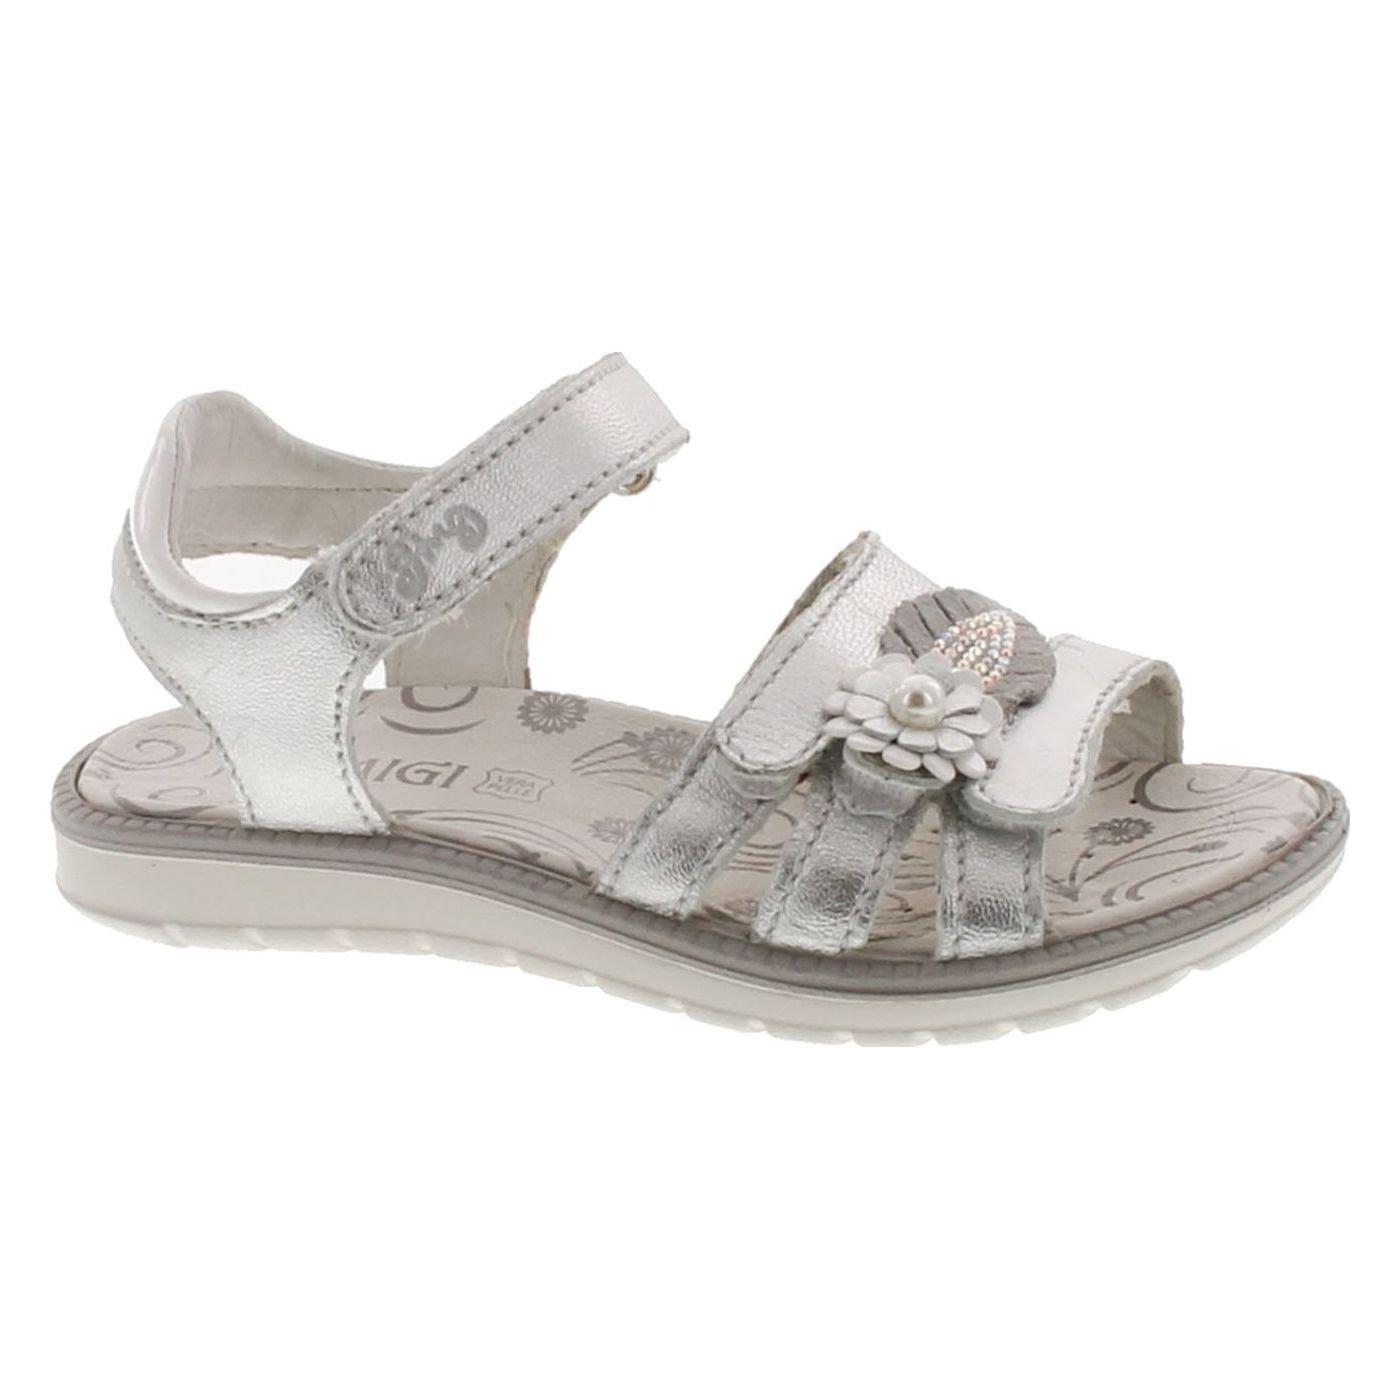 Primigi Girls 13808 Leather European Fashion Sandals